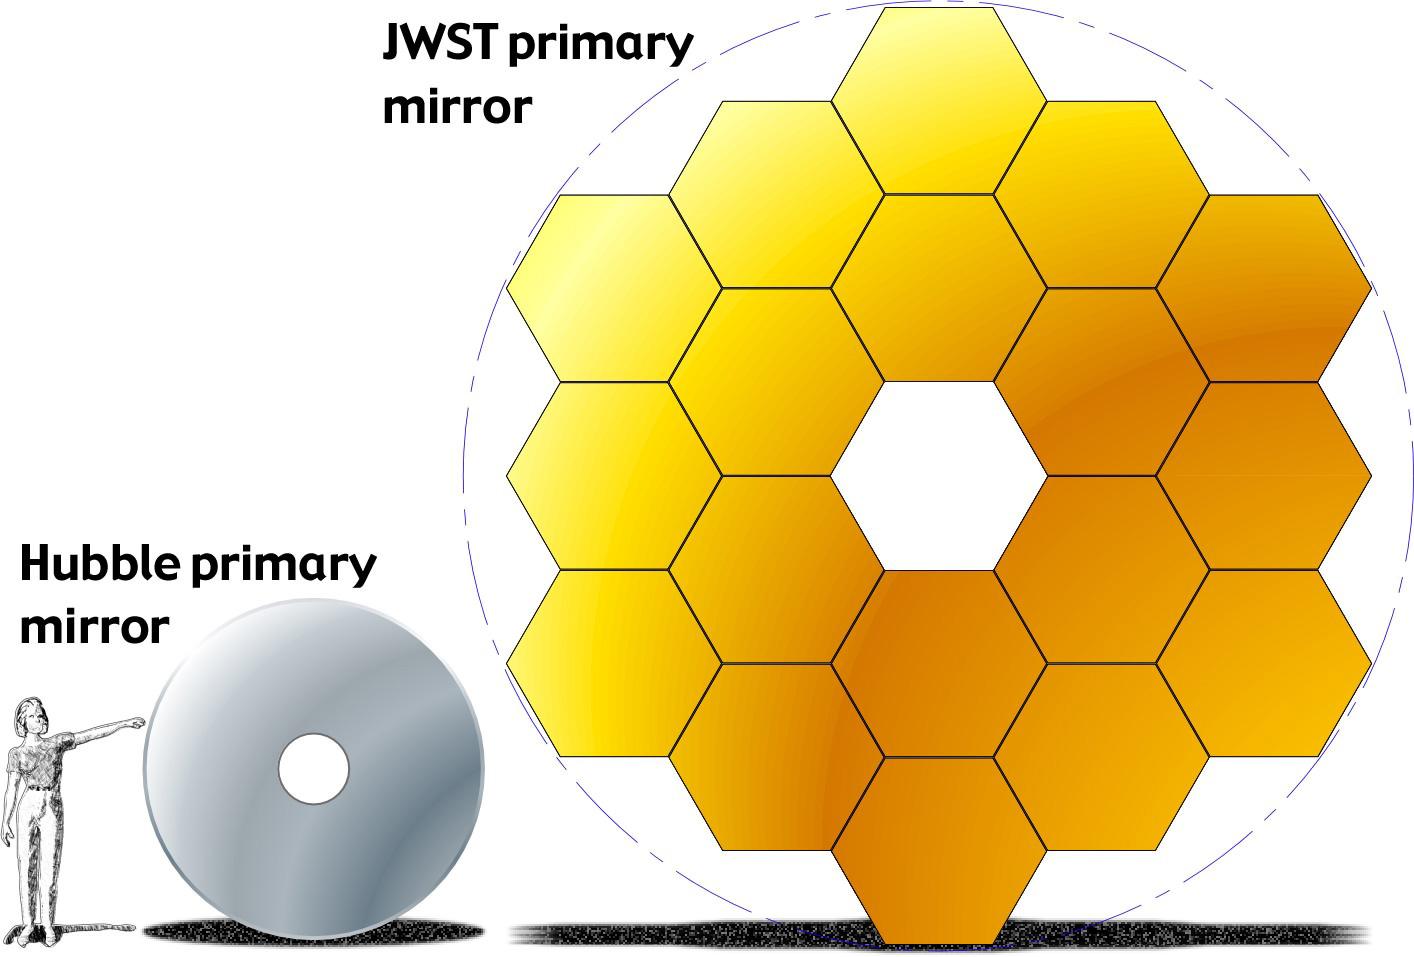 external image jwst-hst-primary-mirrors-1.jpg